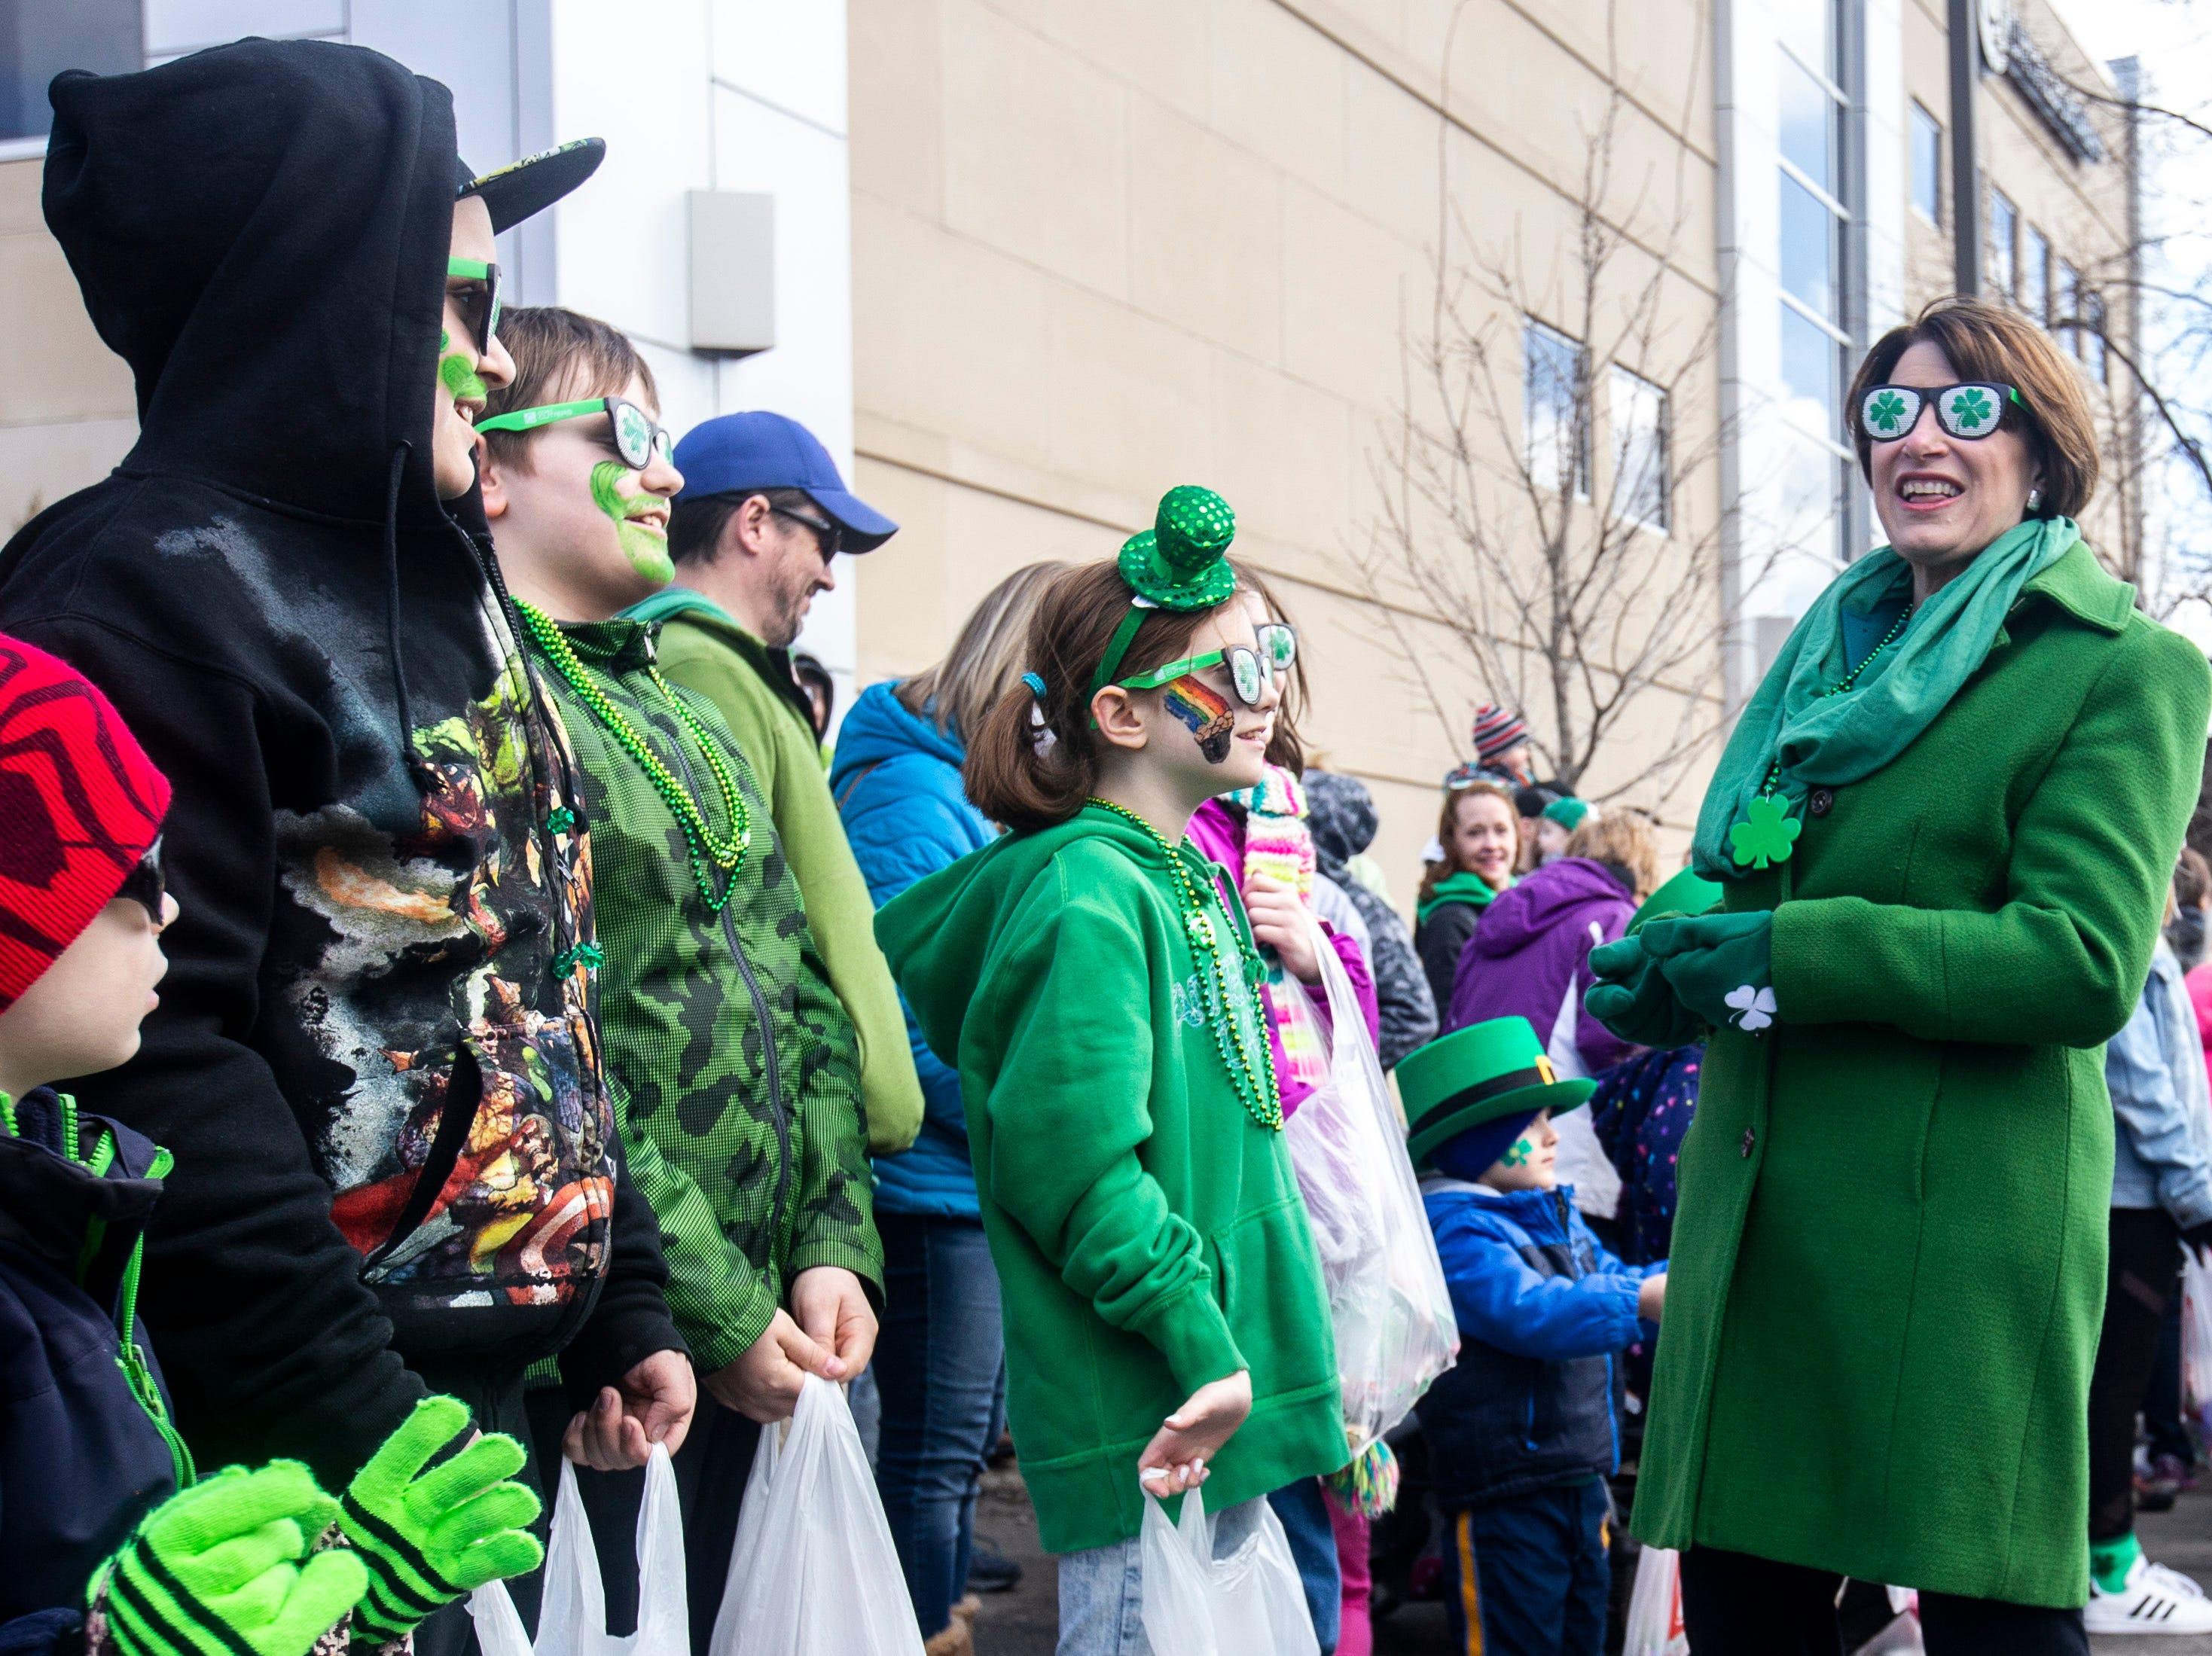 U.S. Sen. Amy Klobuchar, D-Minn., tries on a pair of shamrock sunglasses while walking in the Saint Patrick's Day Parade Society (SaPaDaPaSo) parade on Sunday, March 17, 2019, in downtown Cedar Rapids, Iowa.